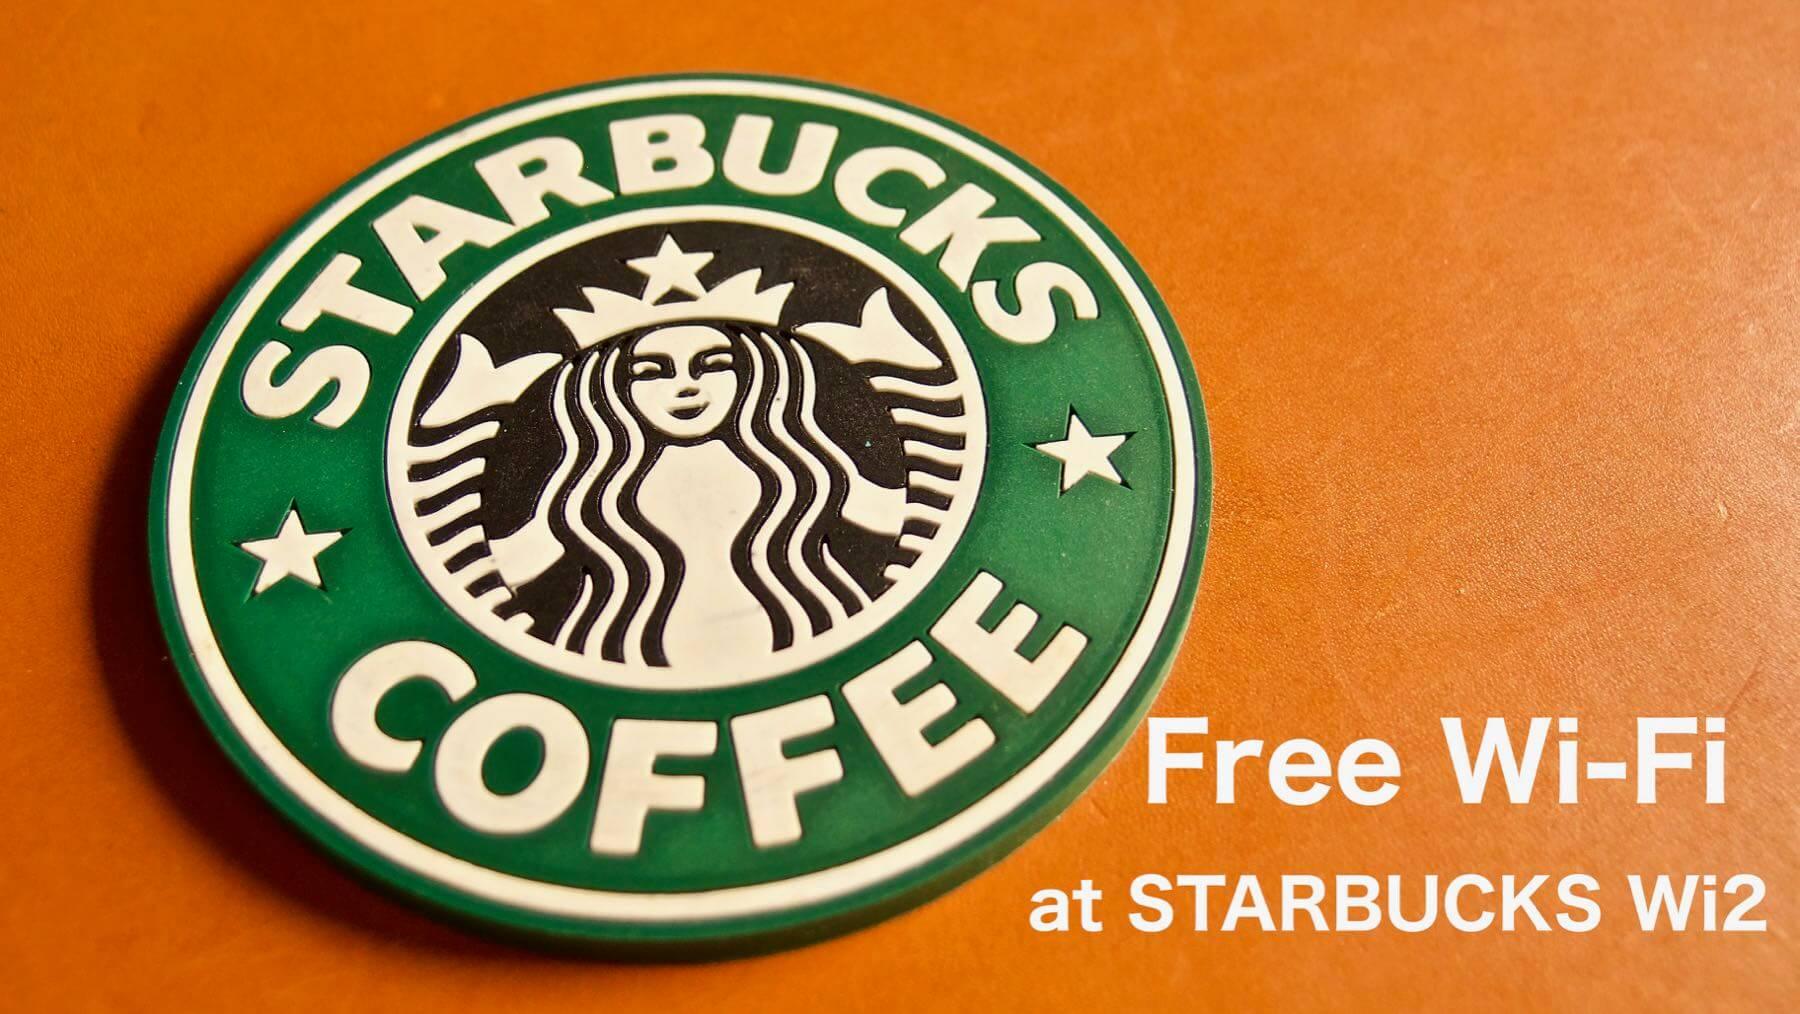 09 Free Wi Fi at Starbucks wi2